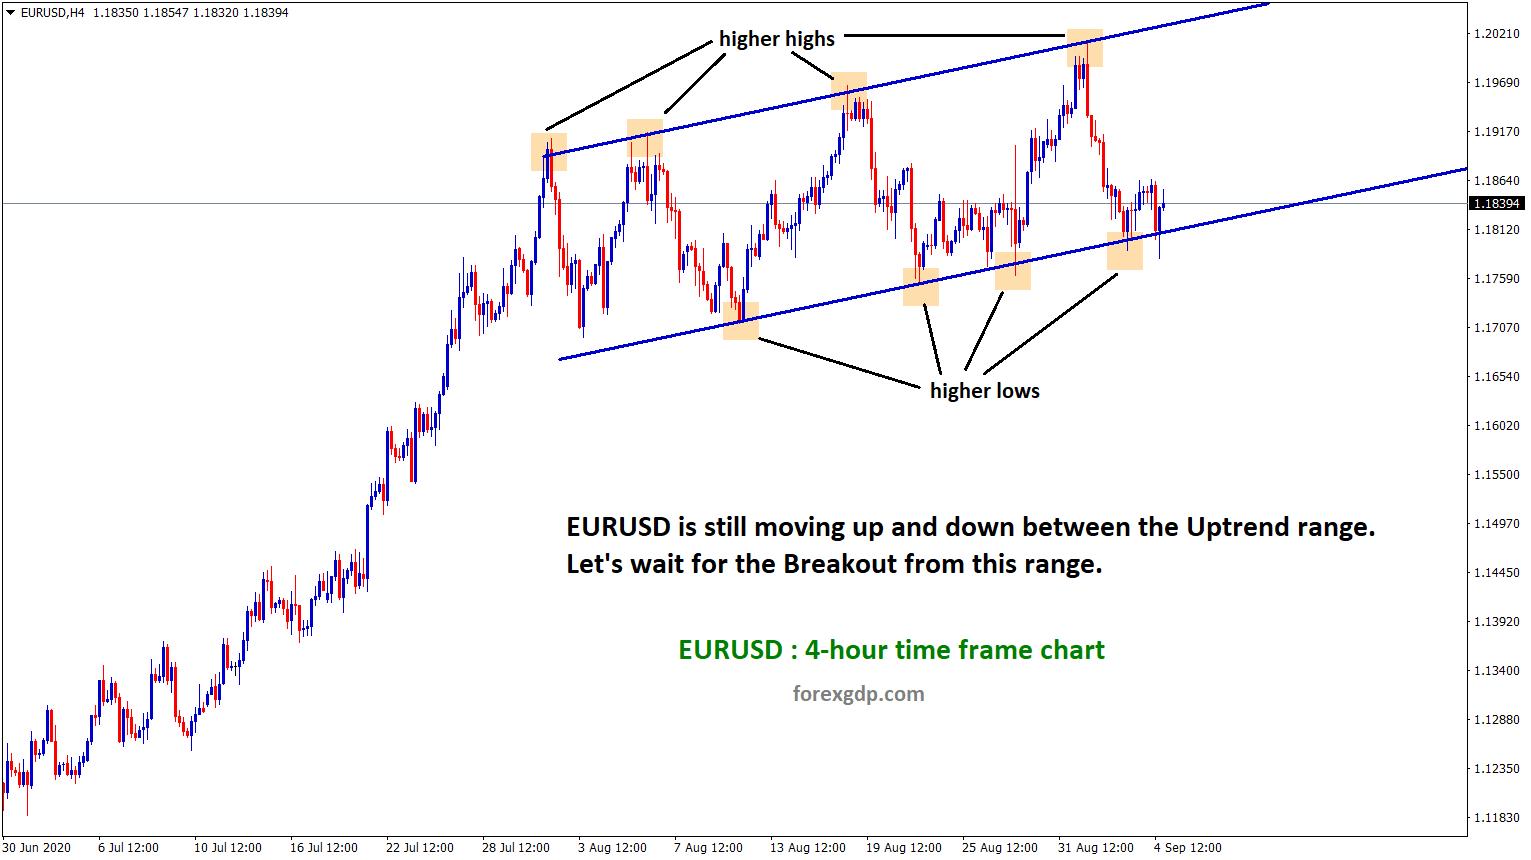 EURUSD uptrend range movement